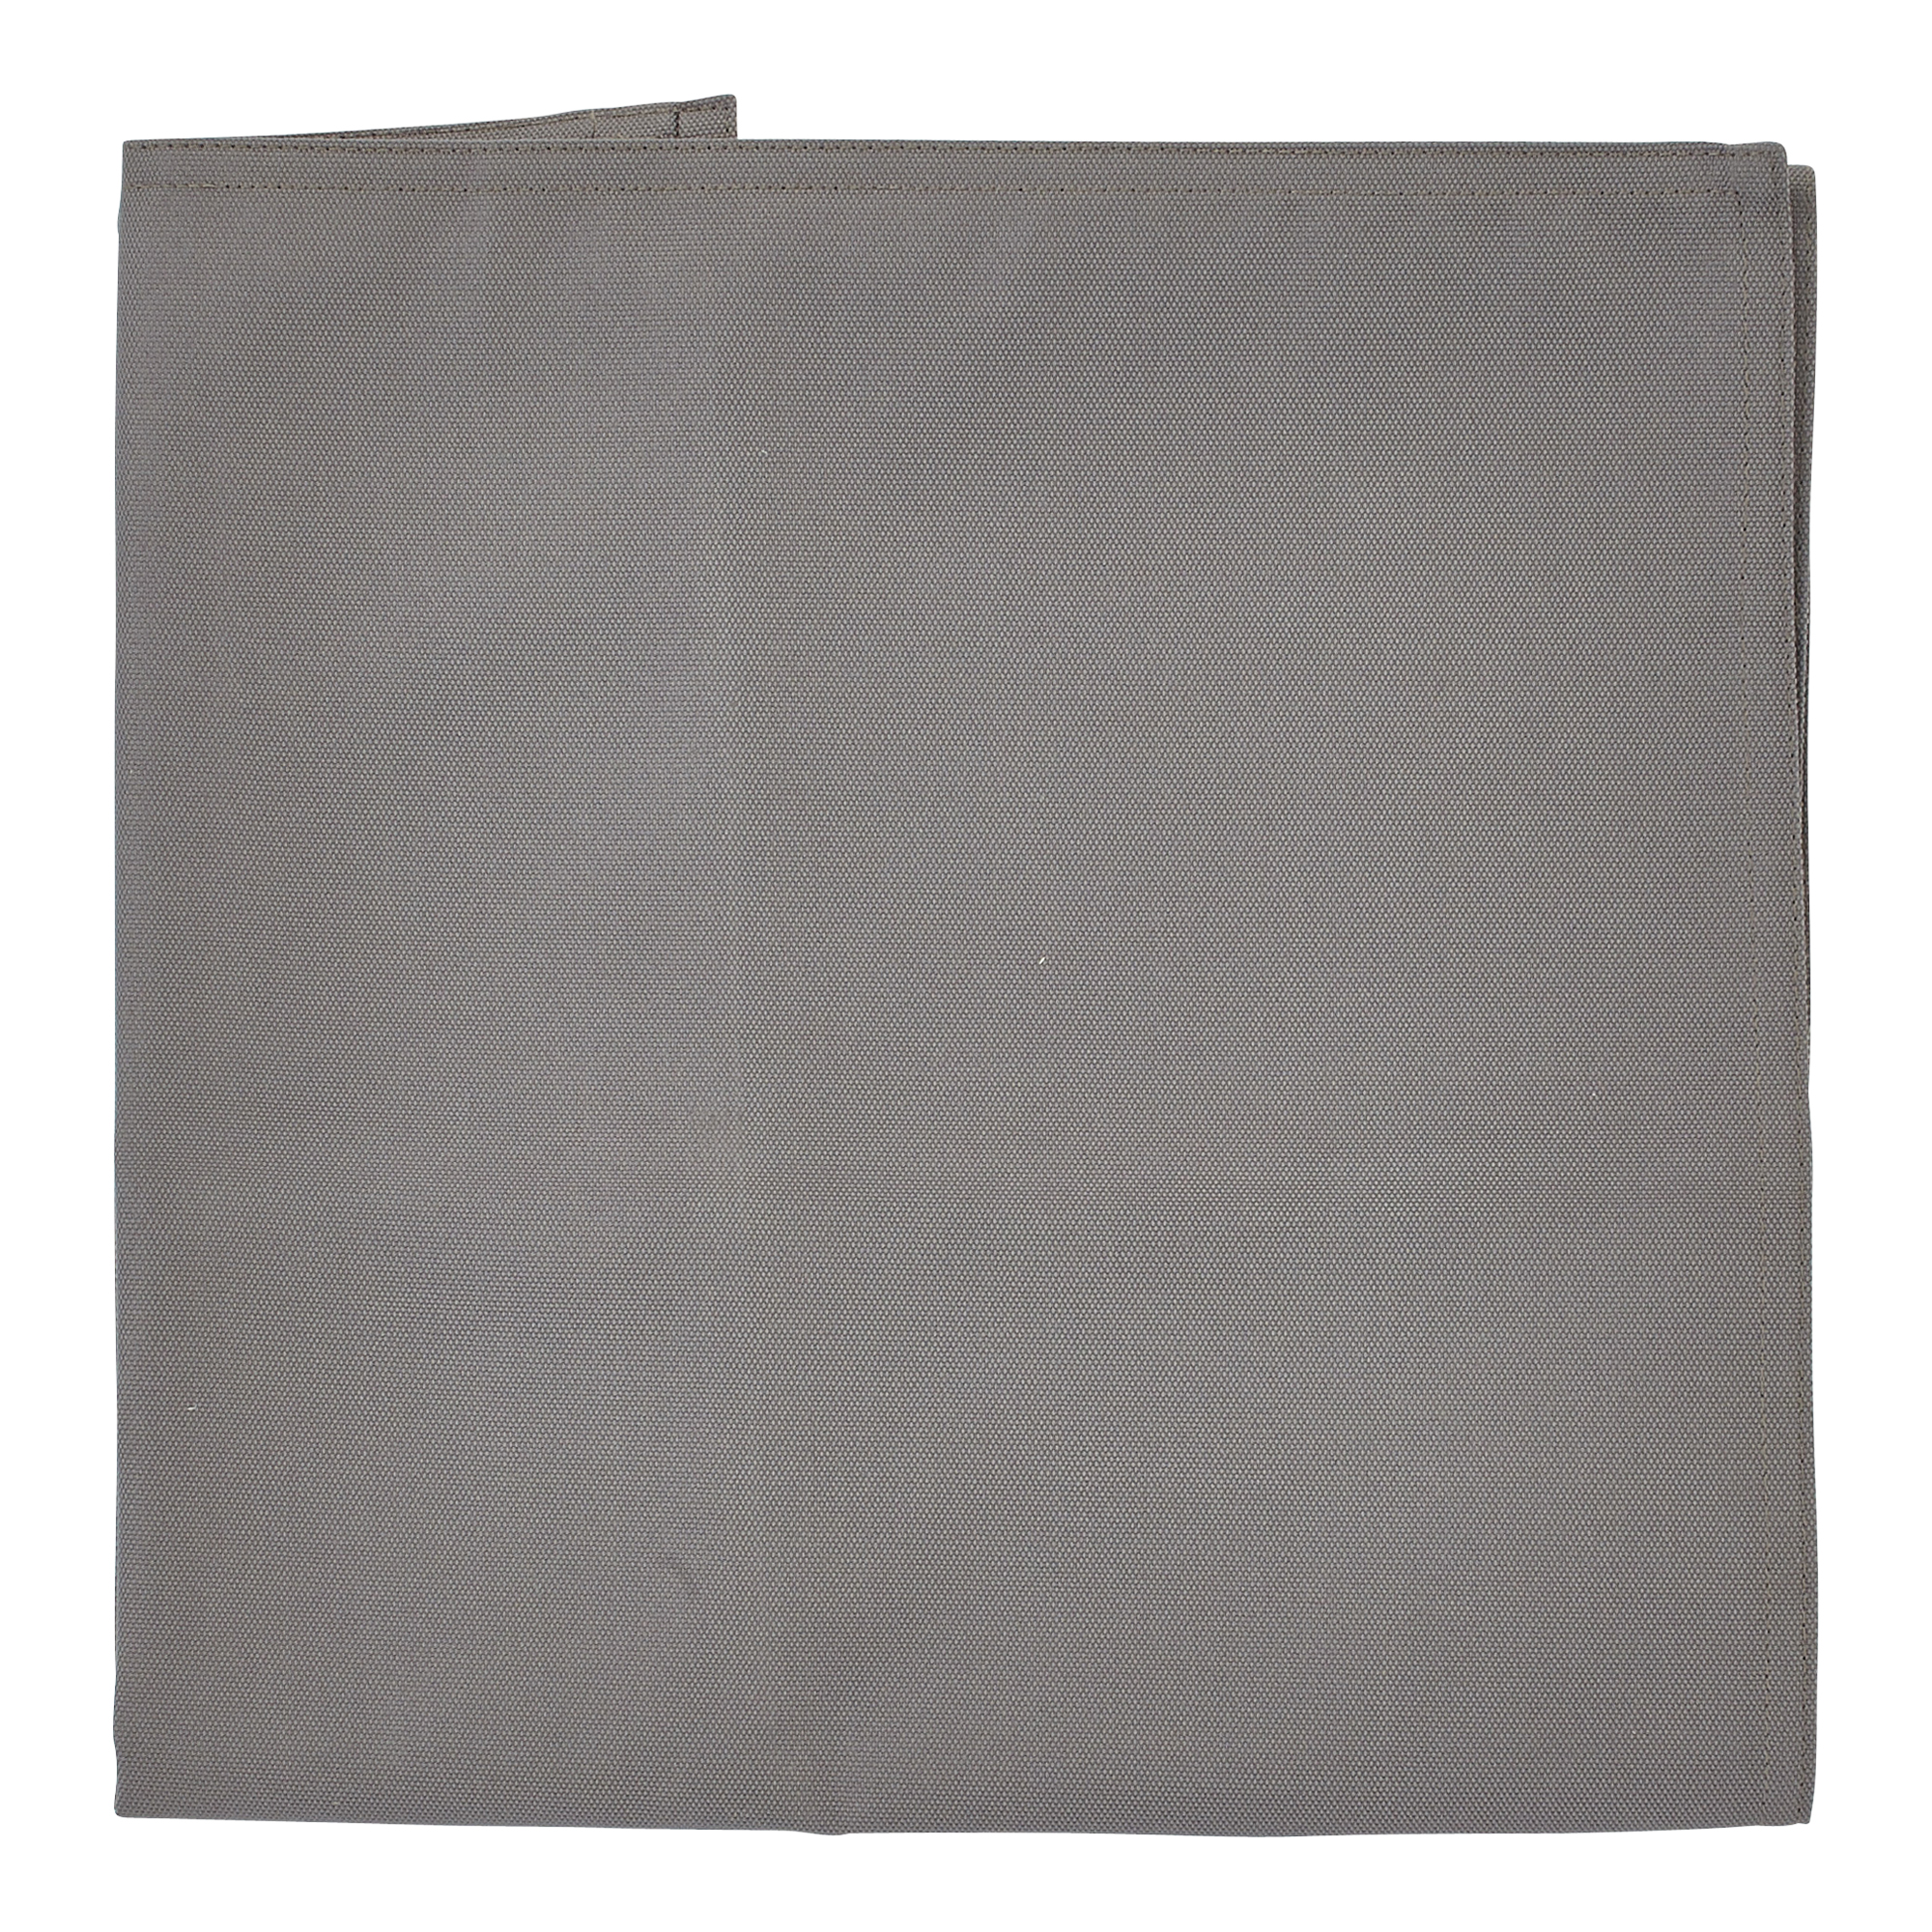 Tafelloper Sunny 45x150 cm donkergrijs Outdoor collectie